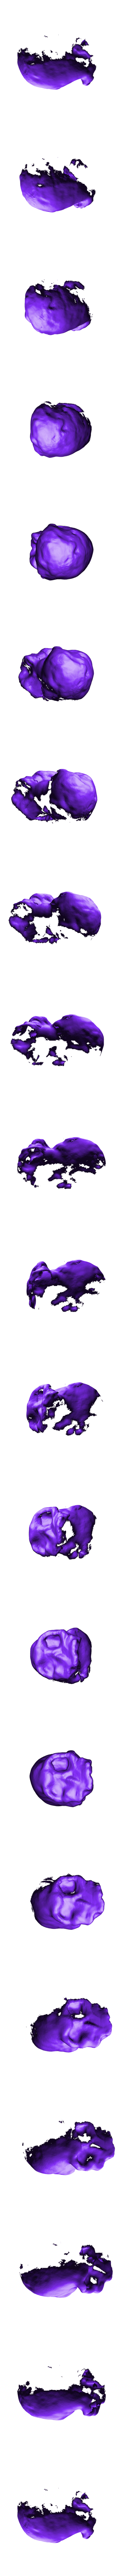 Homo_Habilis_whole.stl Download free STL file Homo Habilis Skull • 3D print template, sjpiper145